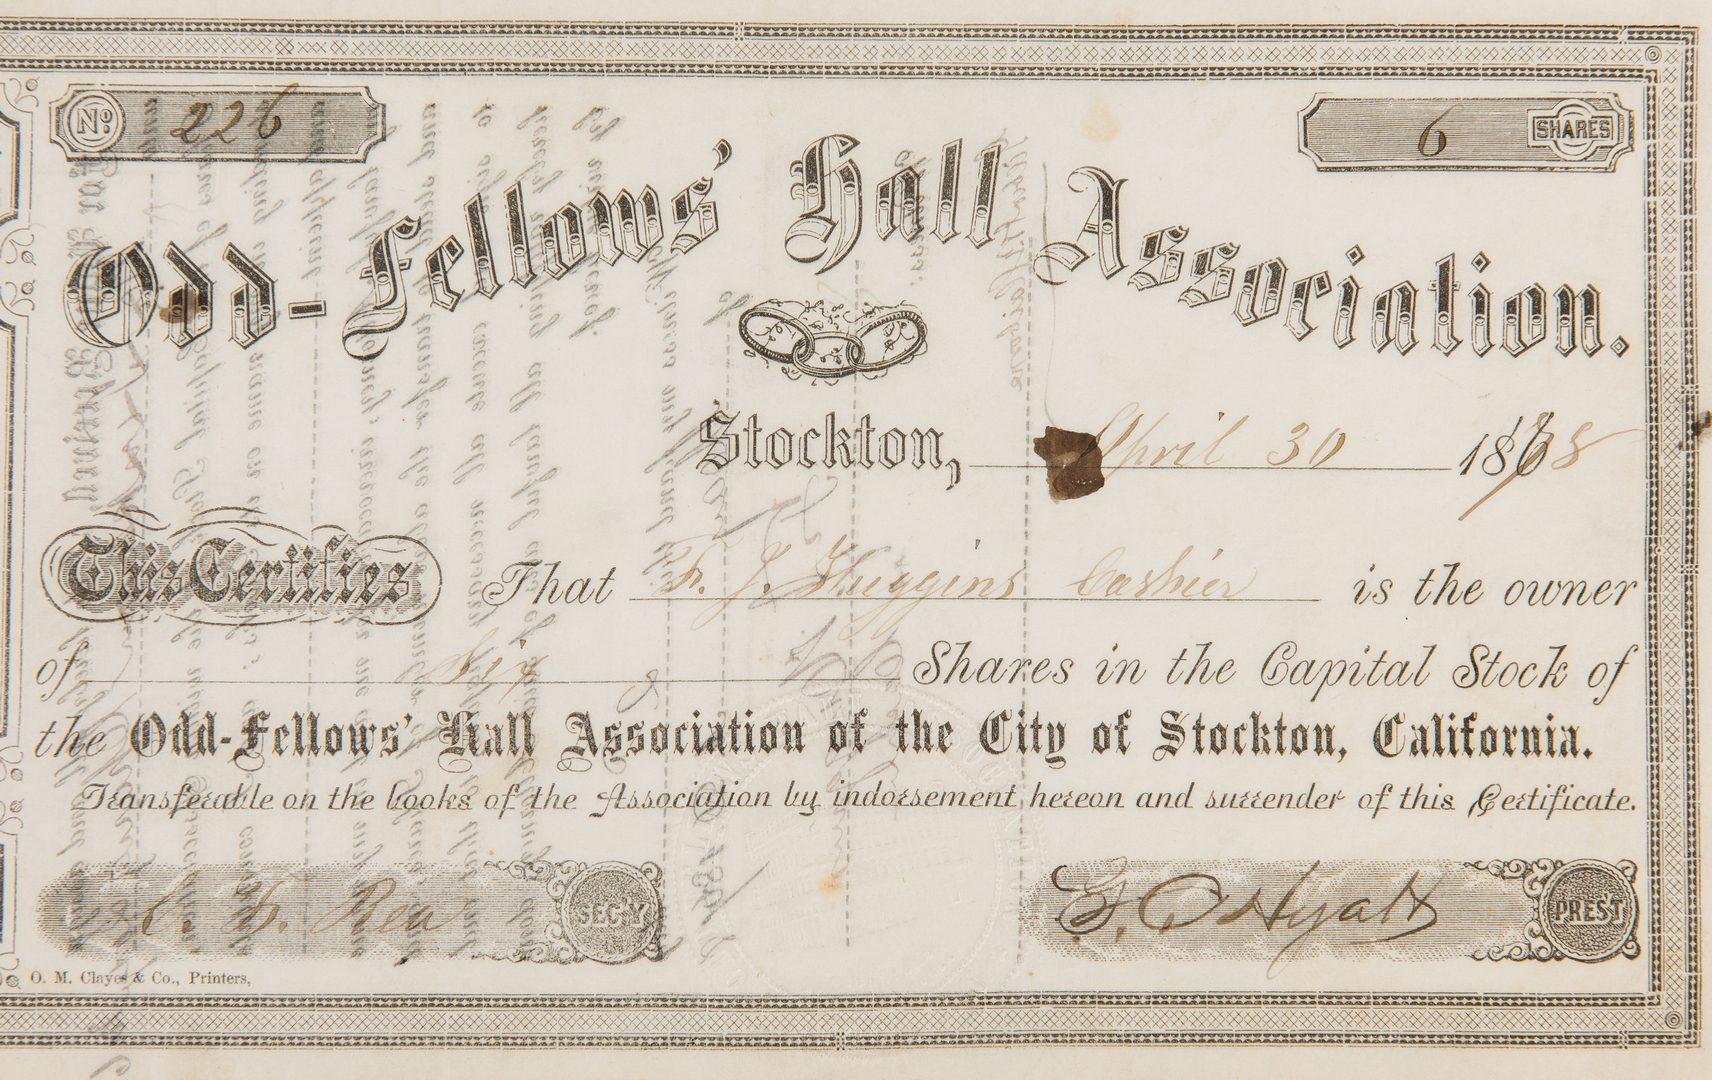 Lot 820: 252 19th/20th Century Stocks & Bonds